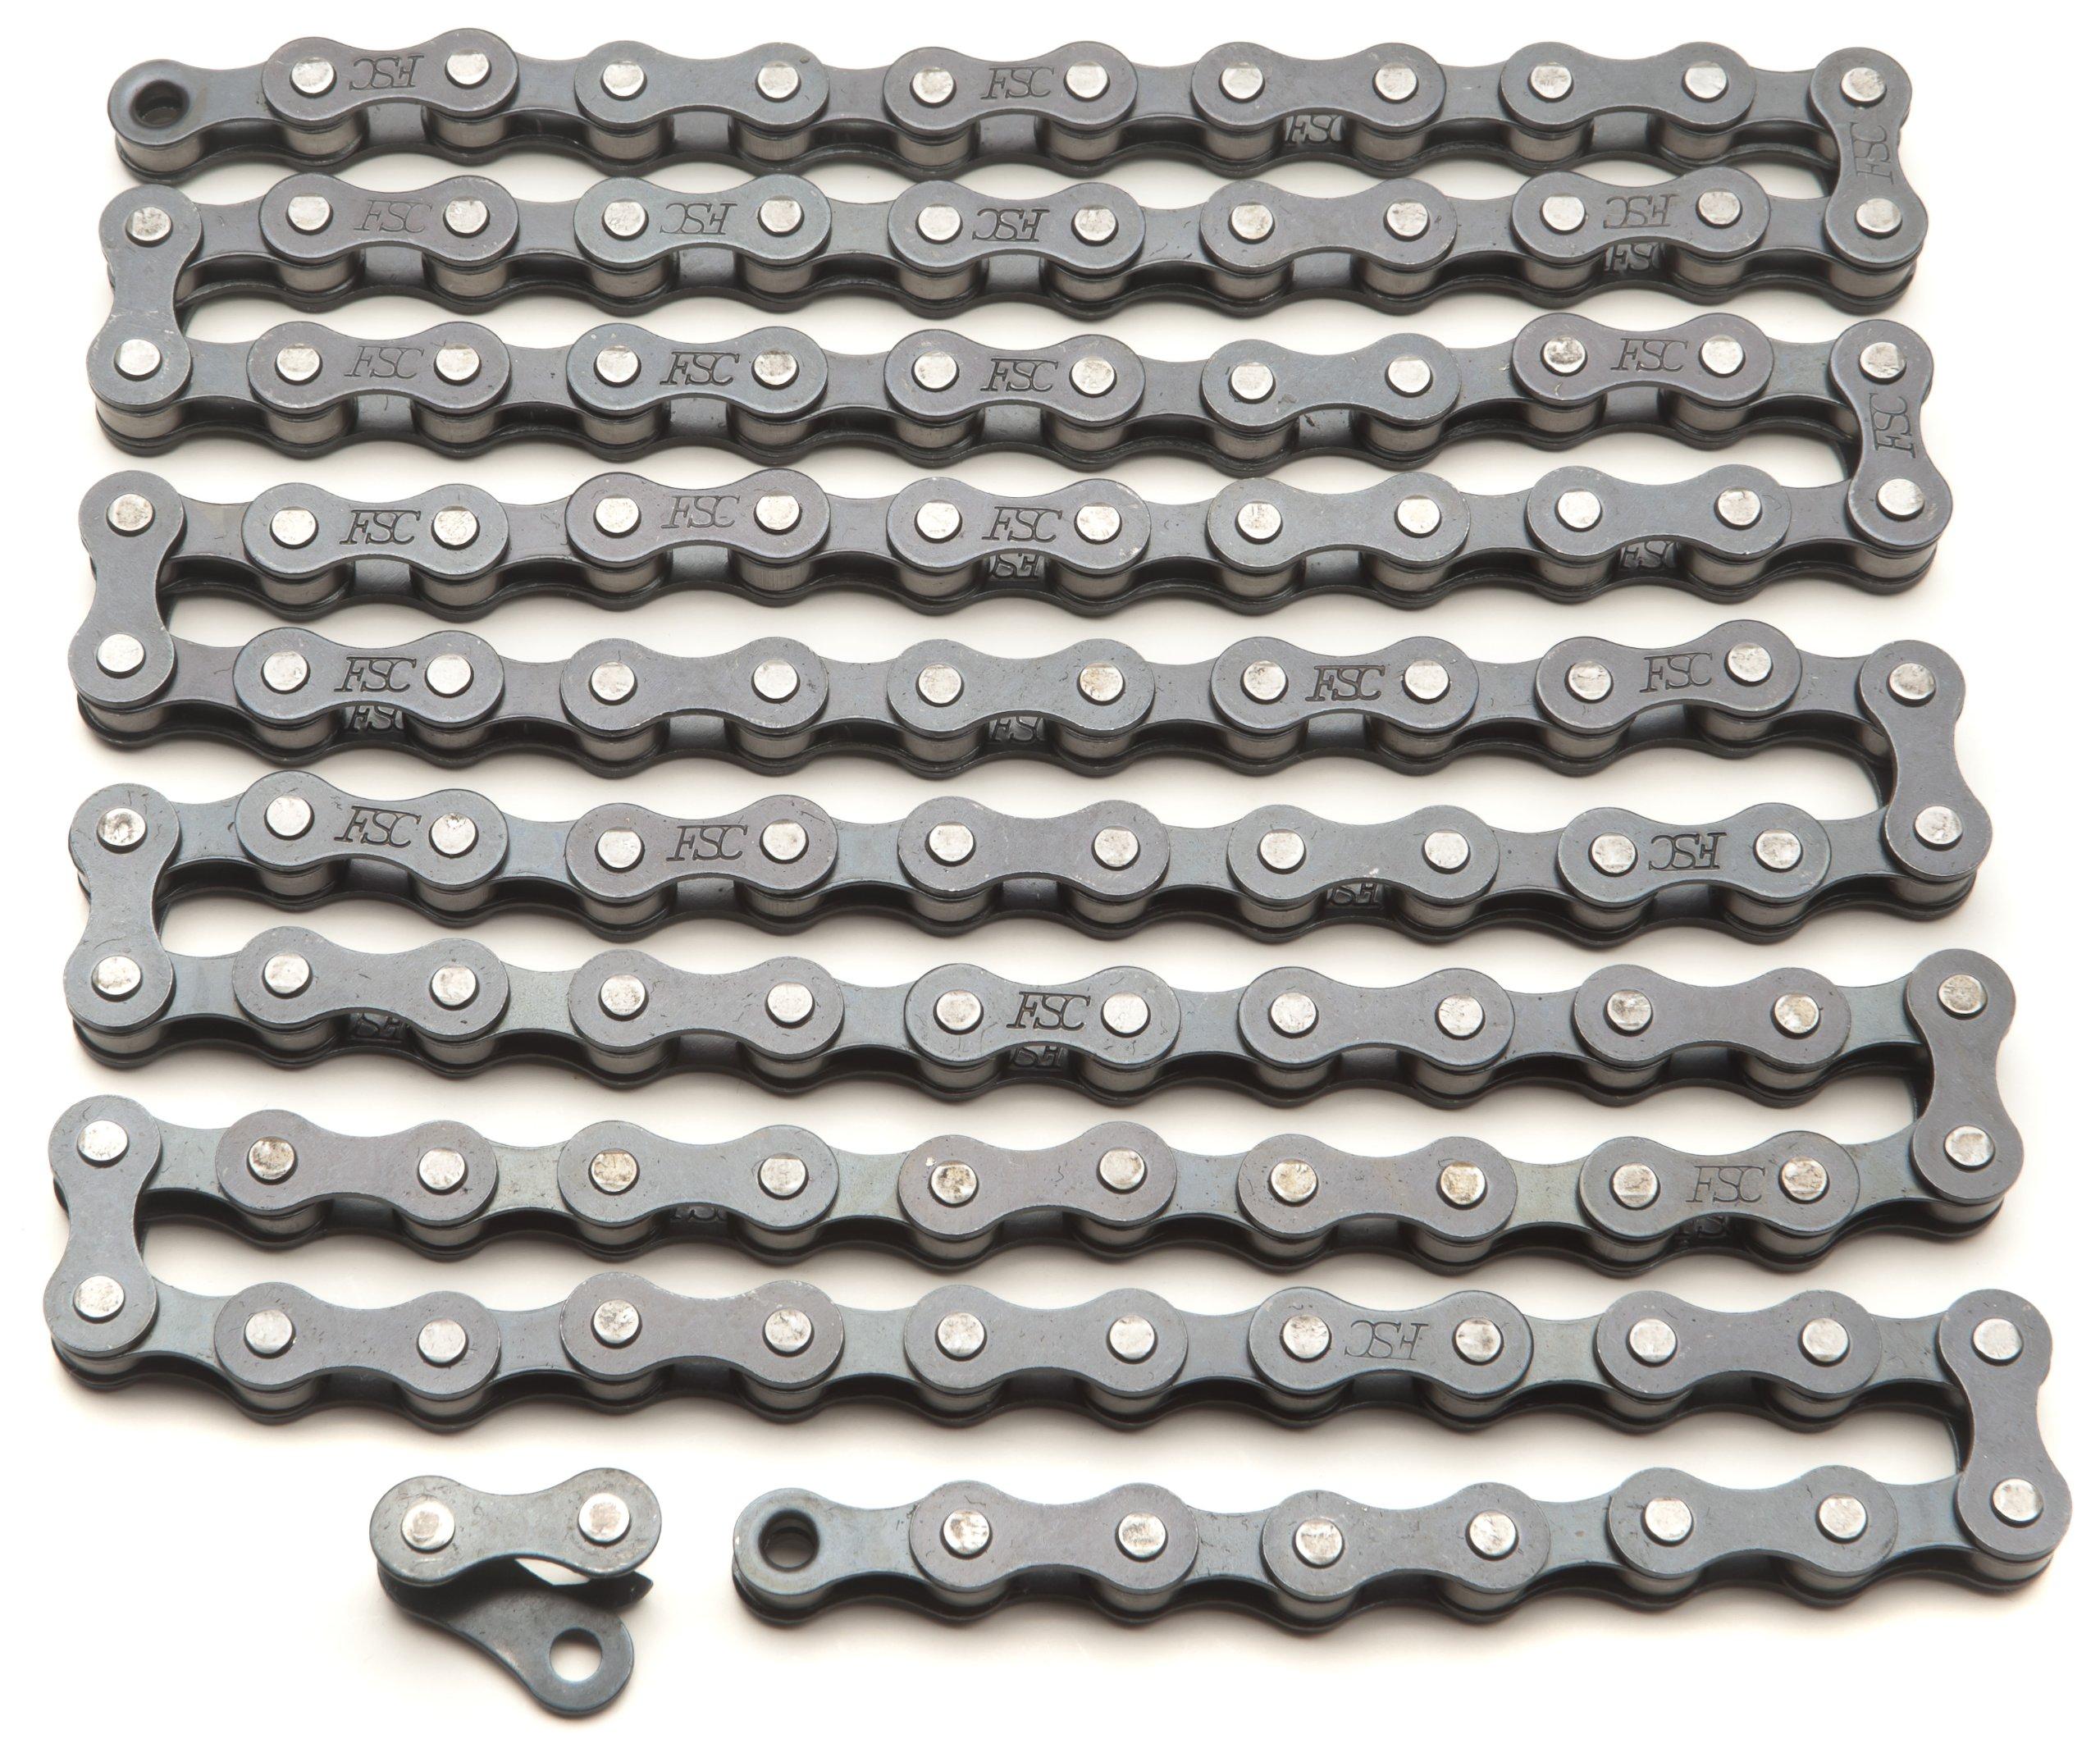 Schwinn Bicycle Chain (1/2 inches x 1/8 inches) by Schwinn